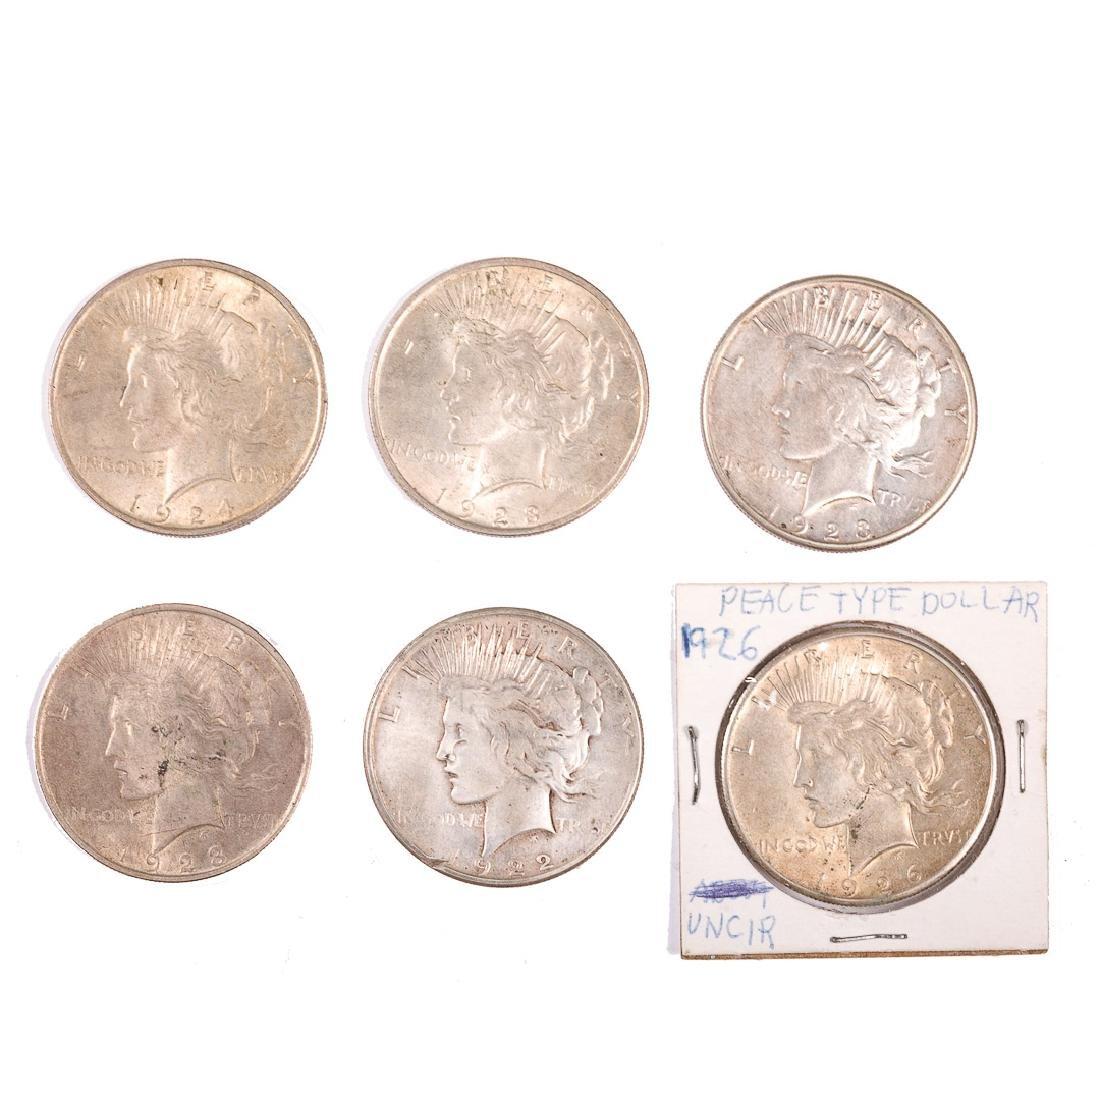 [US] Six Peace Dollars